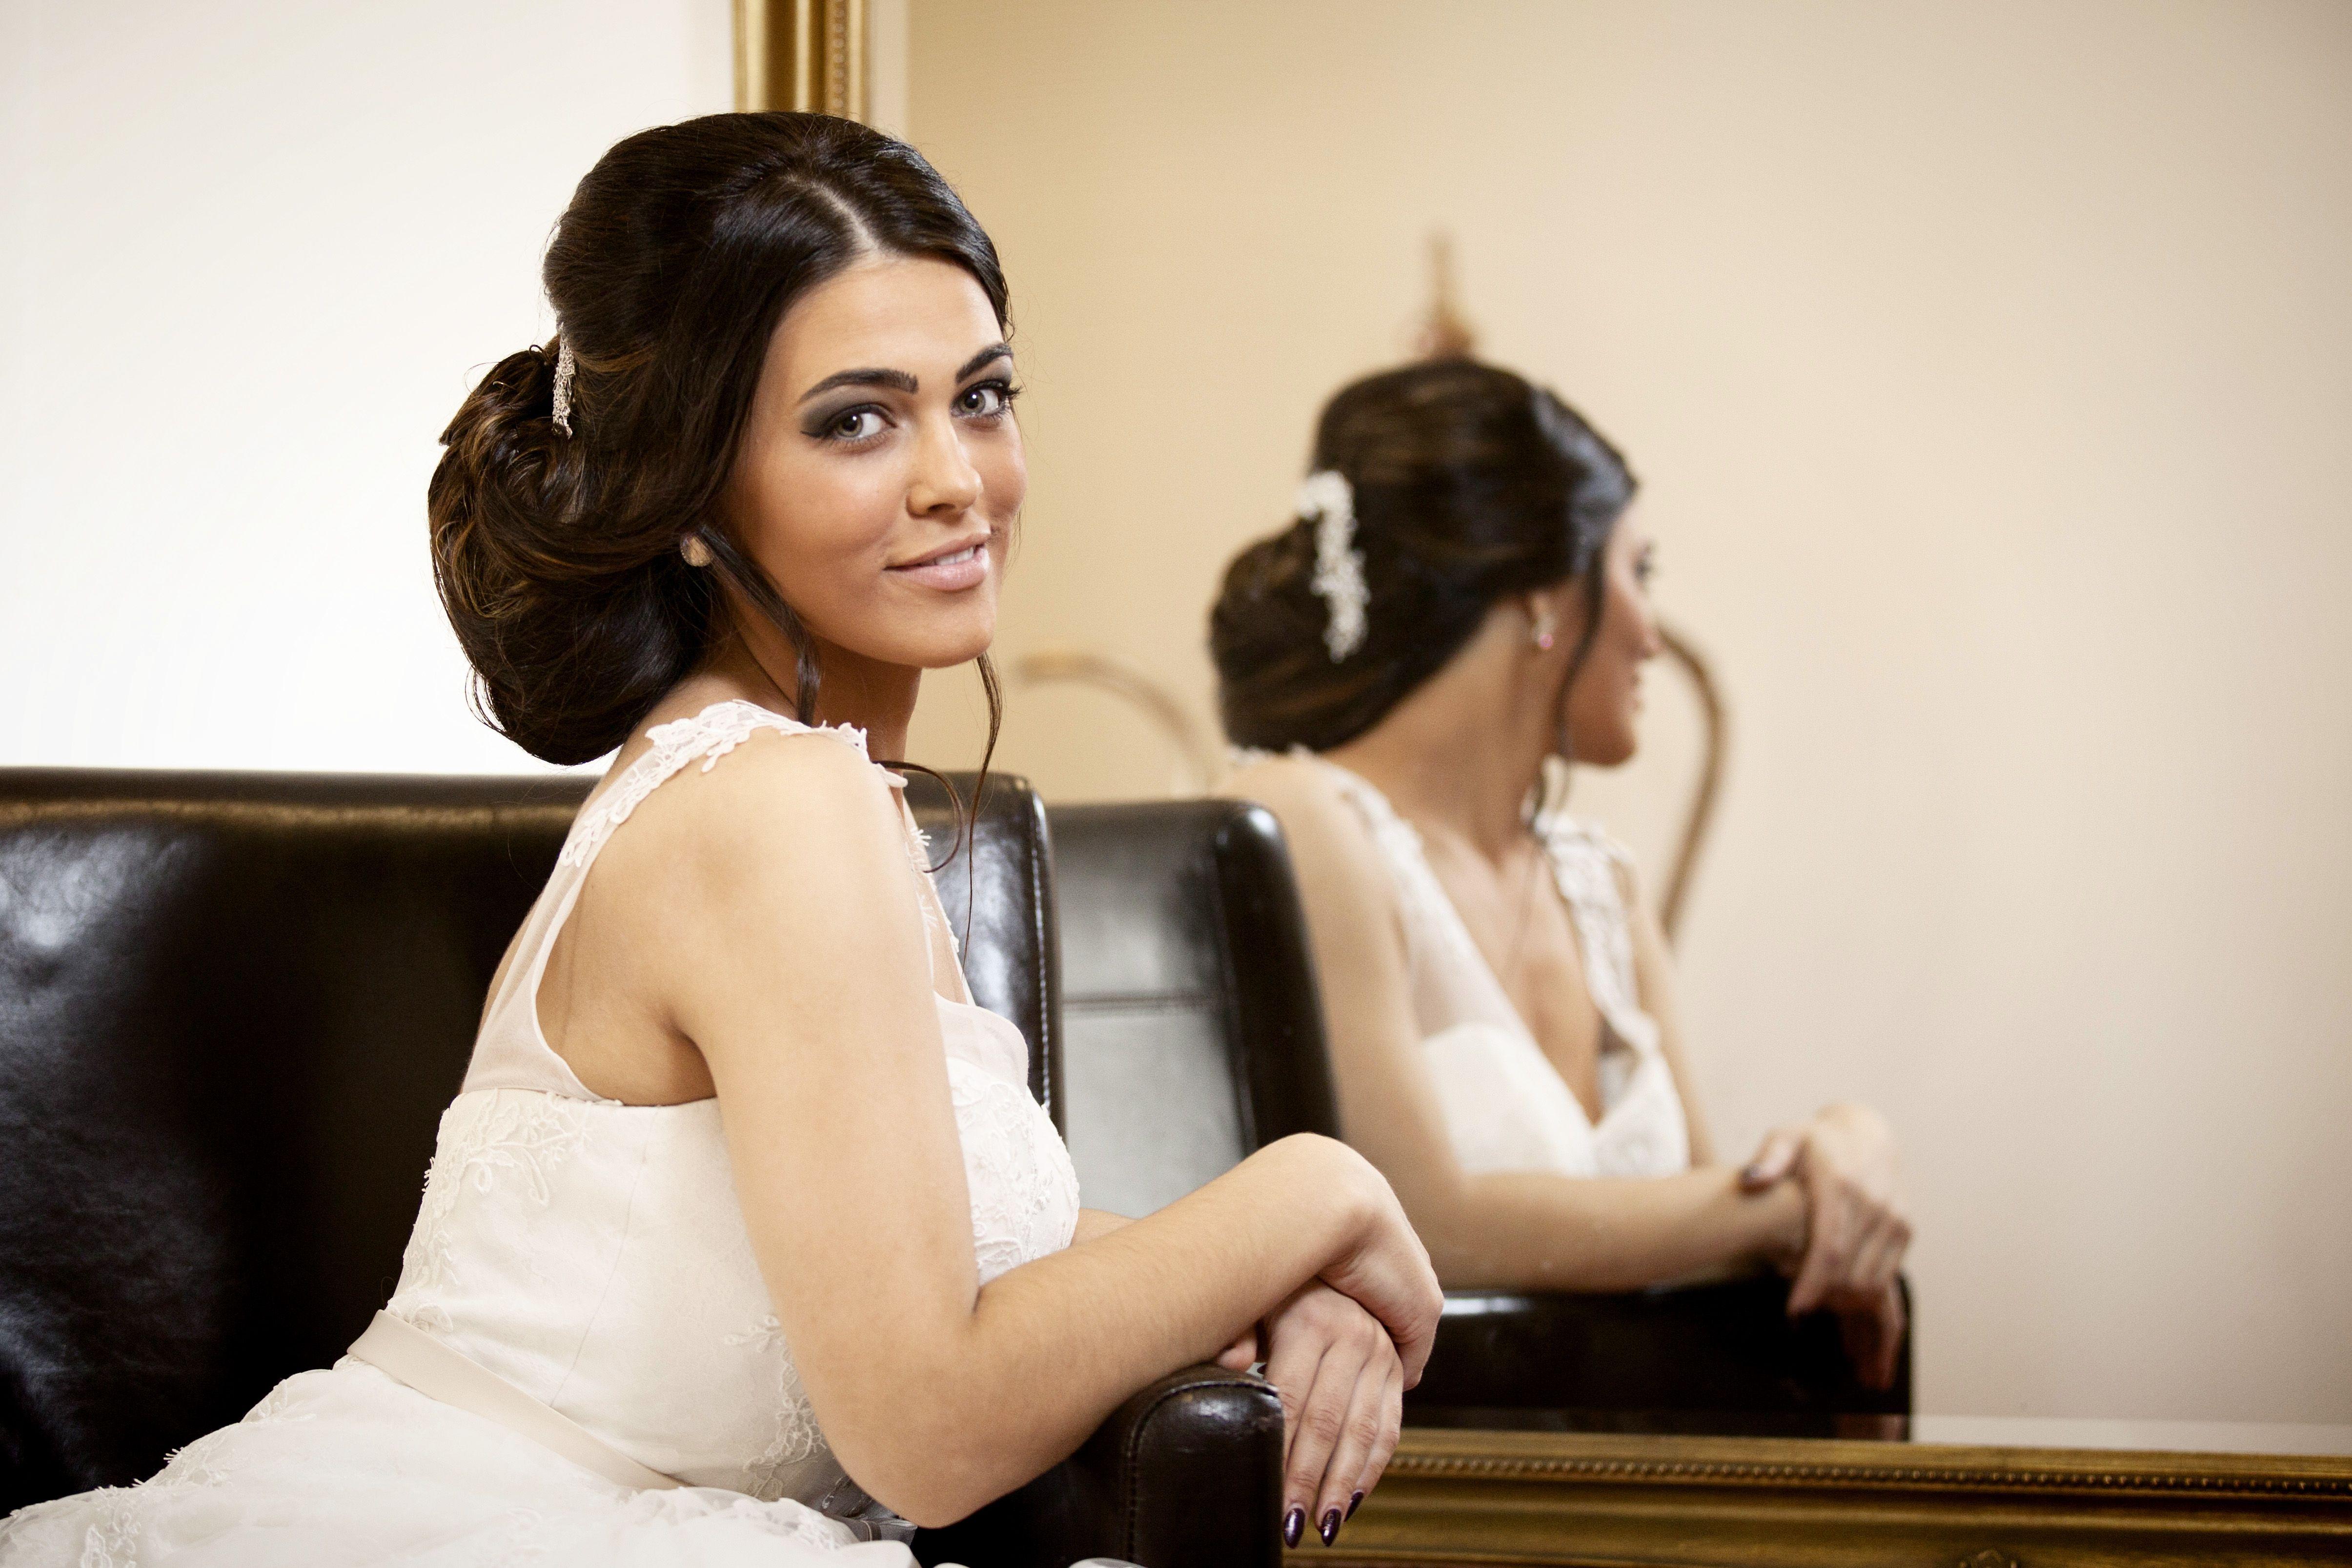 Design your own wedding dress cheap  Classy Wedding Look Inspiration  Design your own Bridal Dress